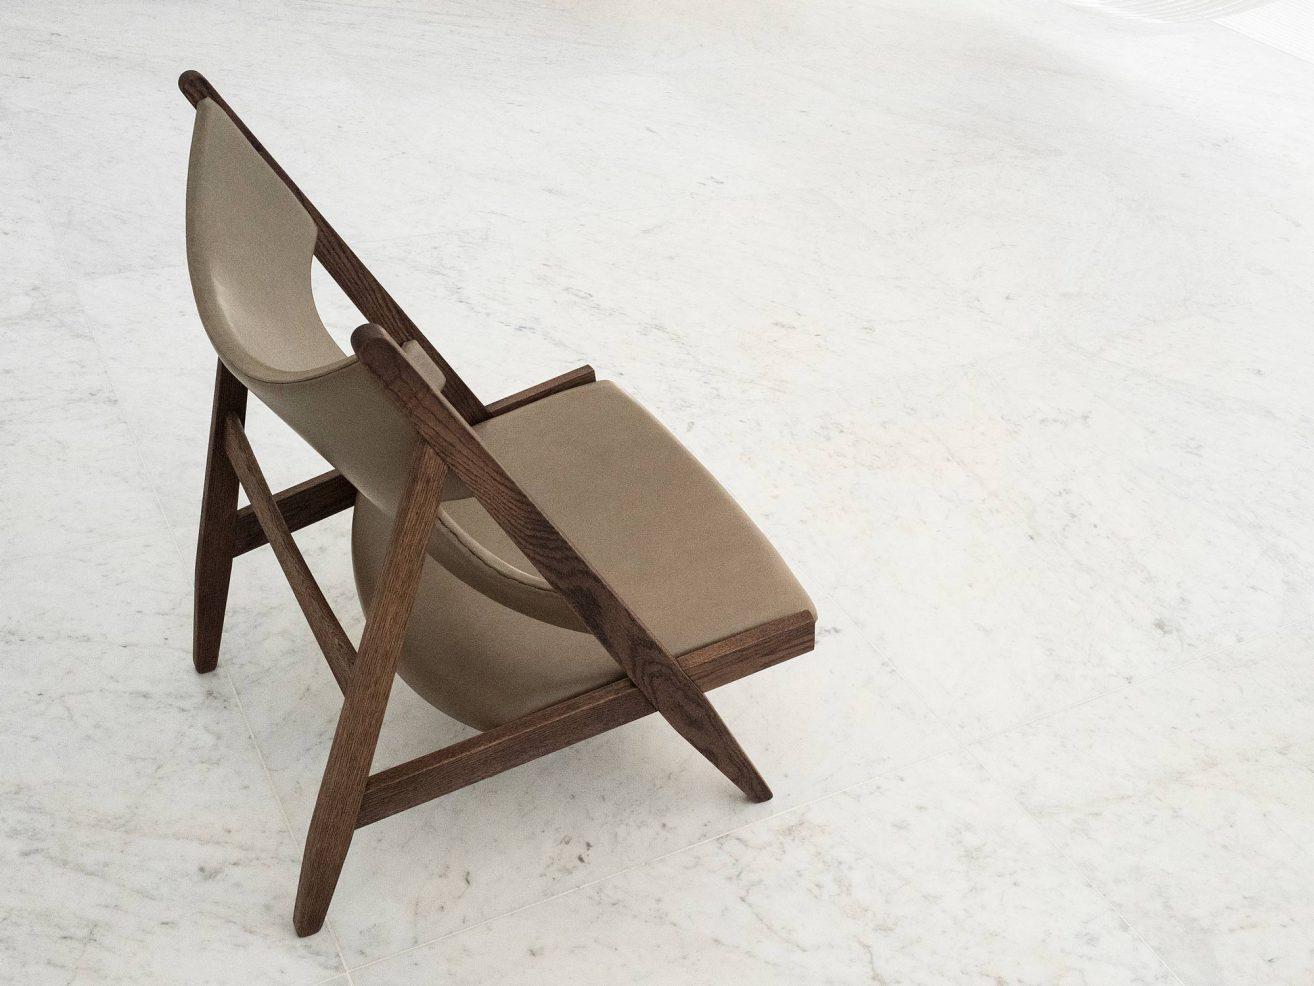 Knitting Chair return – Menu